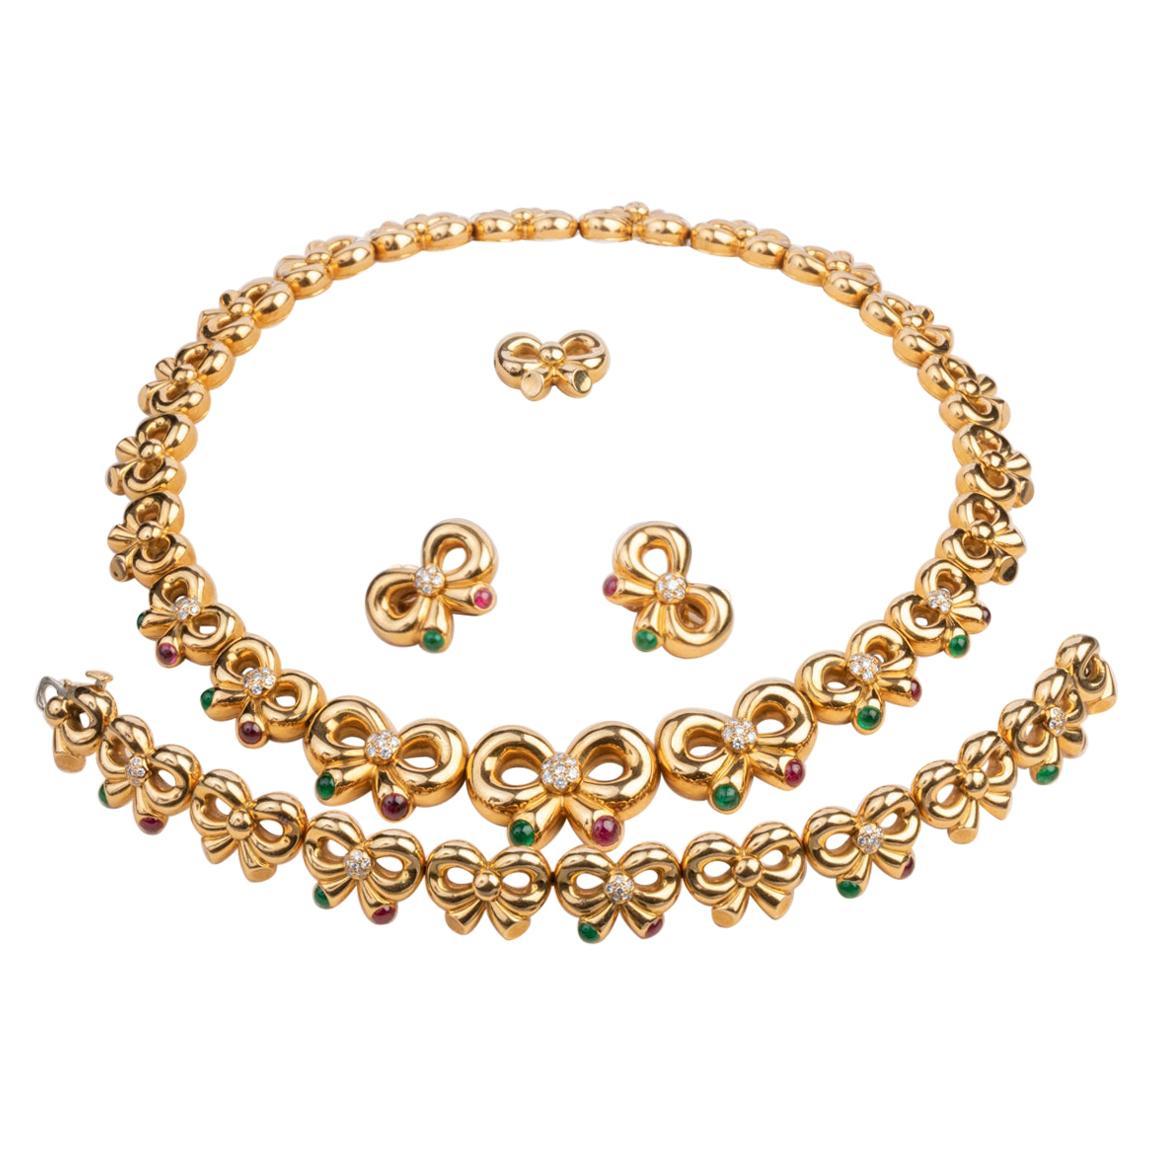 Boucheron Paris Set, Gold and Precious Stones